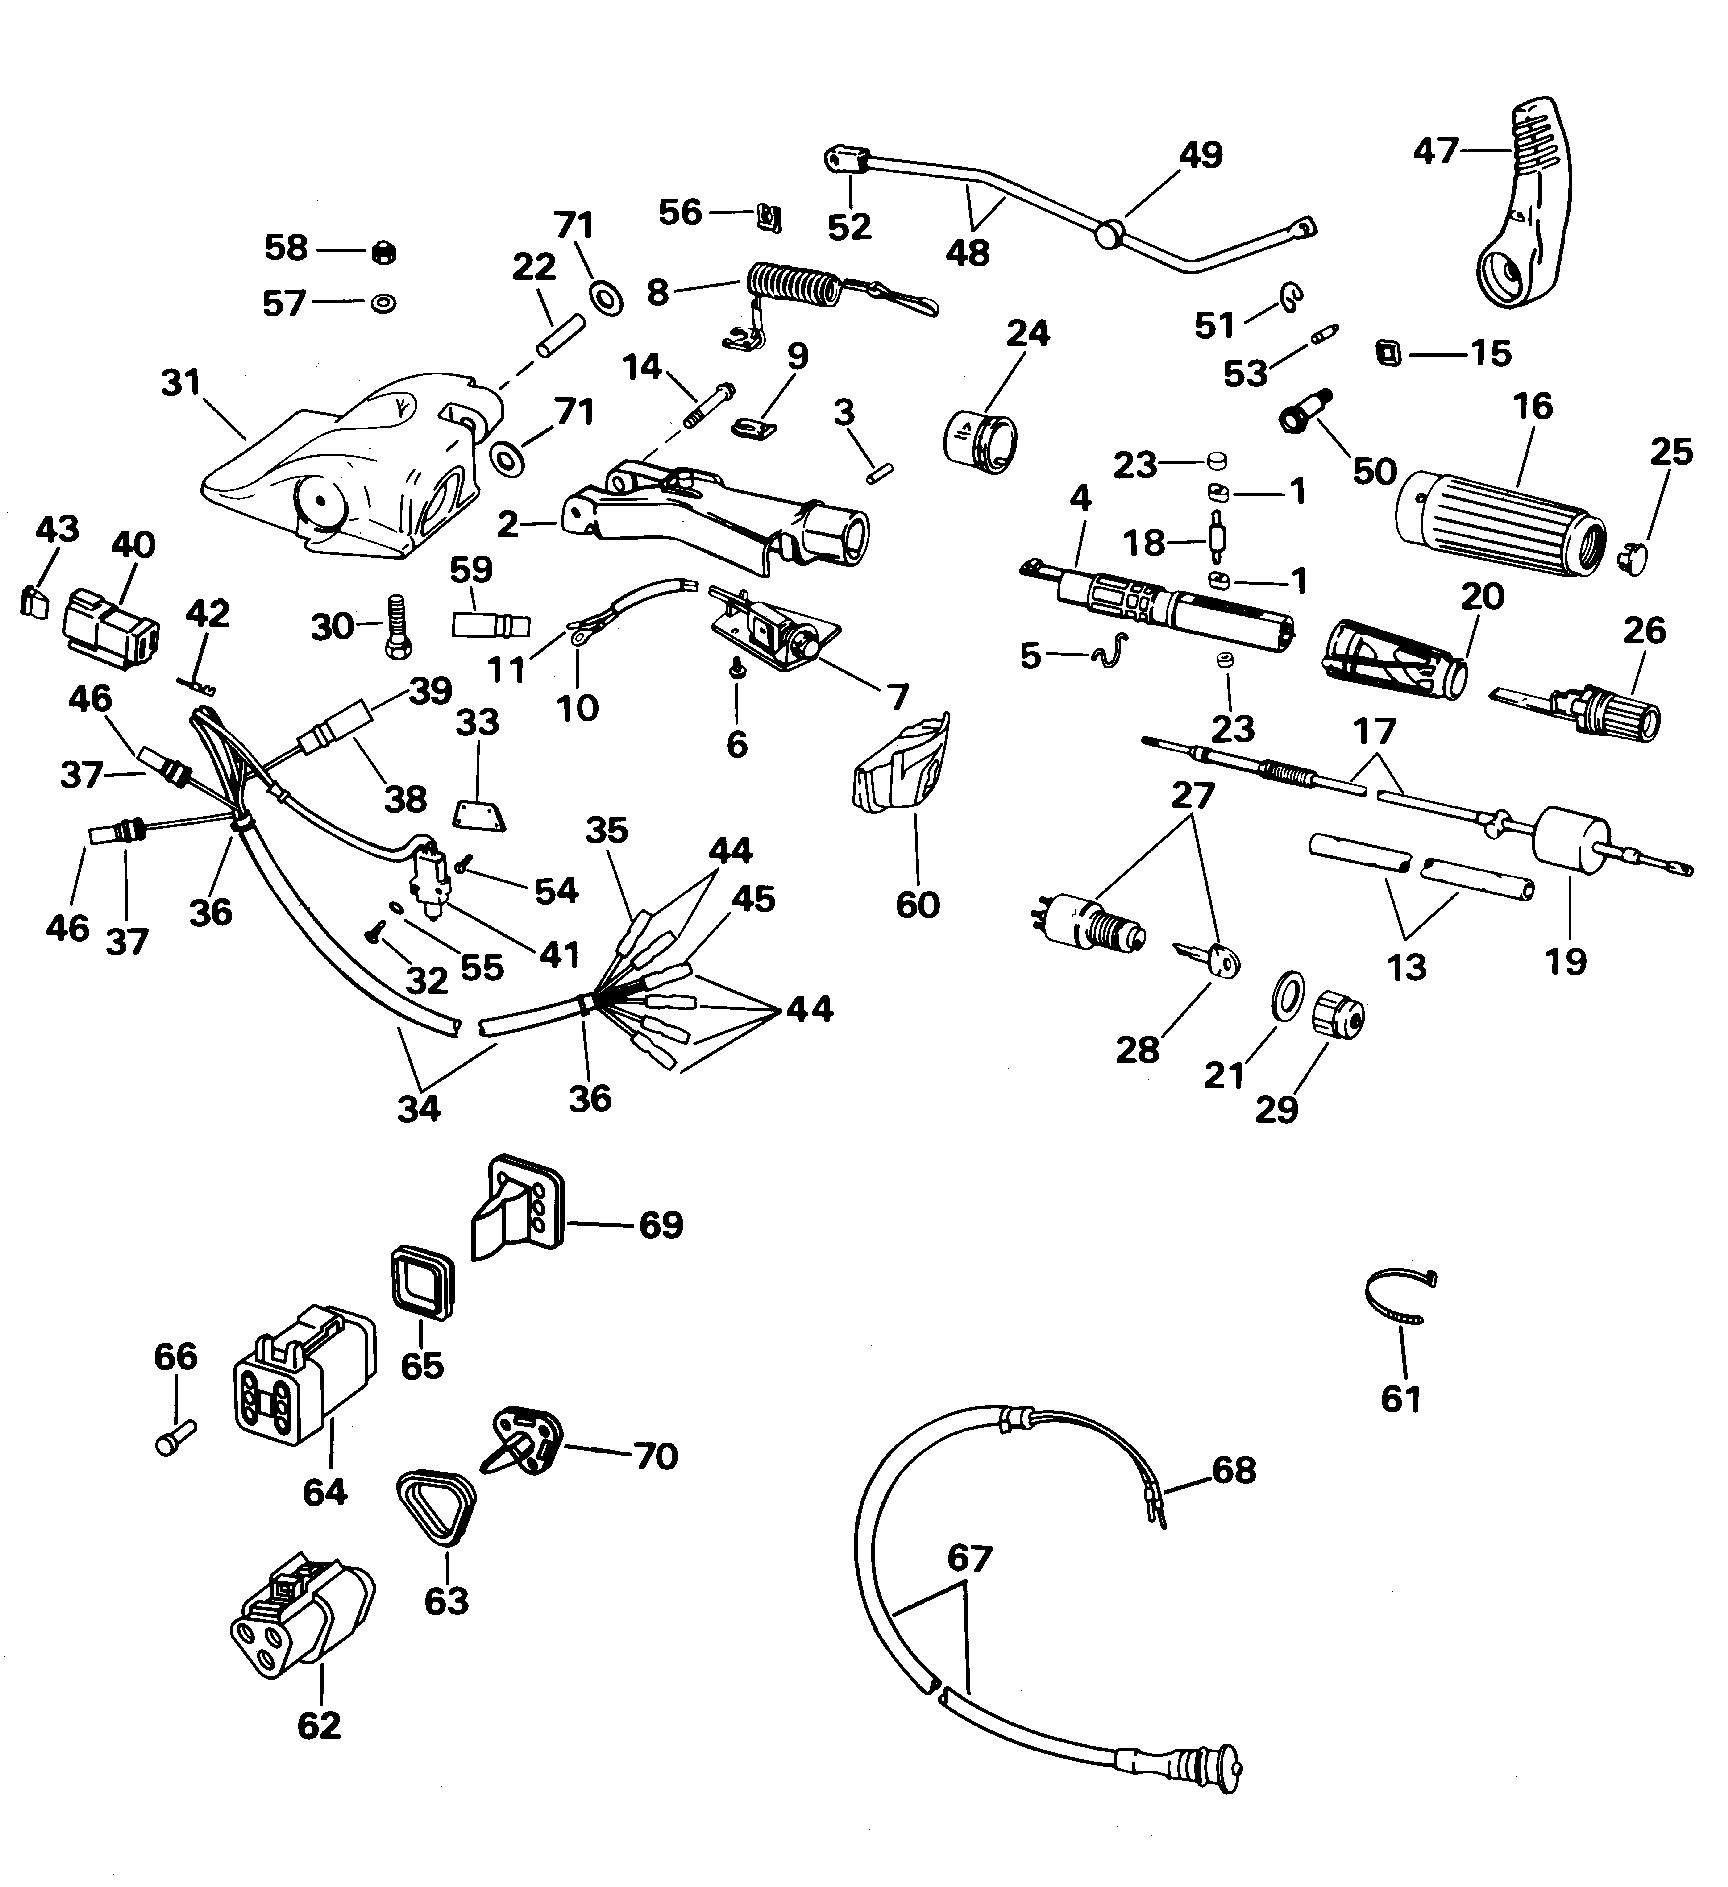 Wiring Diagram Also Eclipse Mitsubishi Wiring Diagram On 95 Eclipse